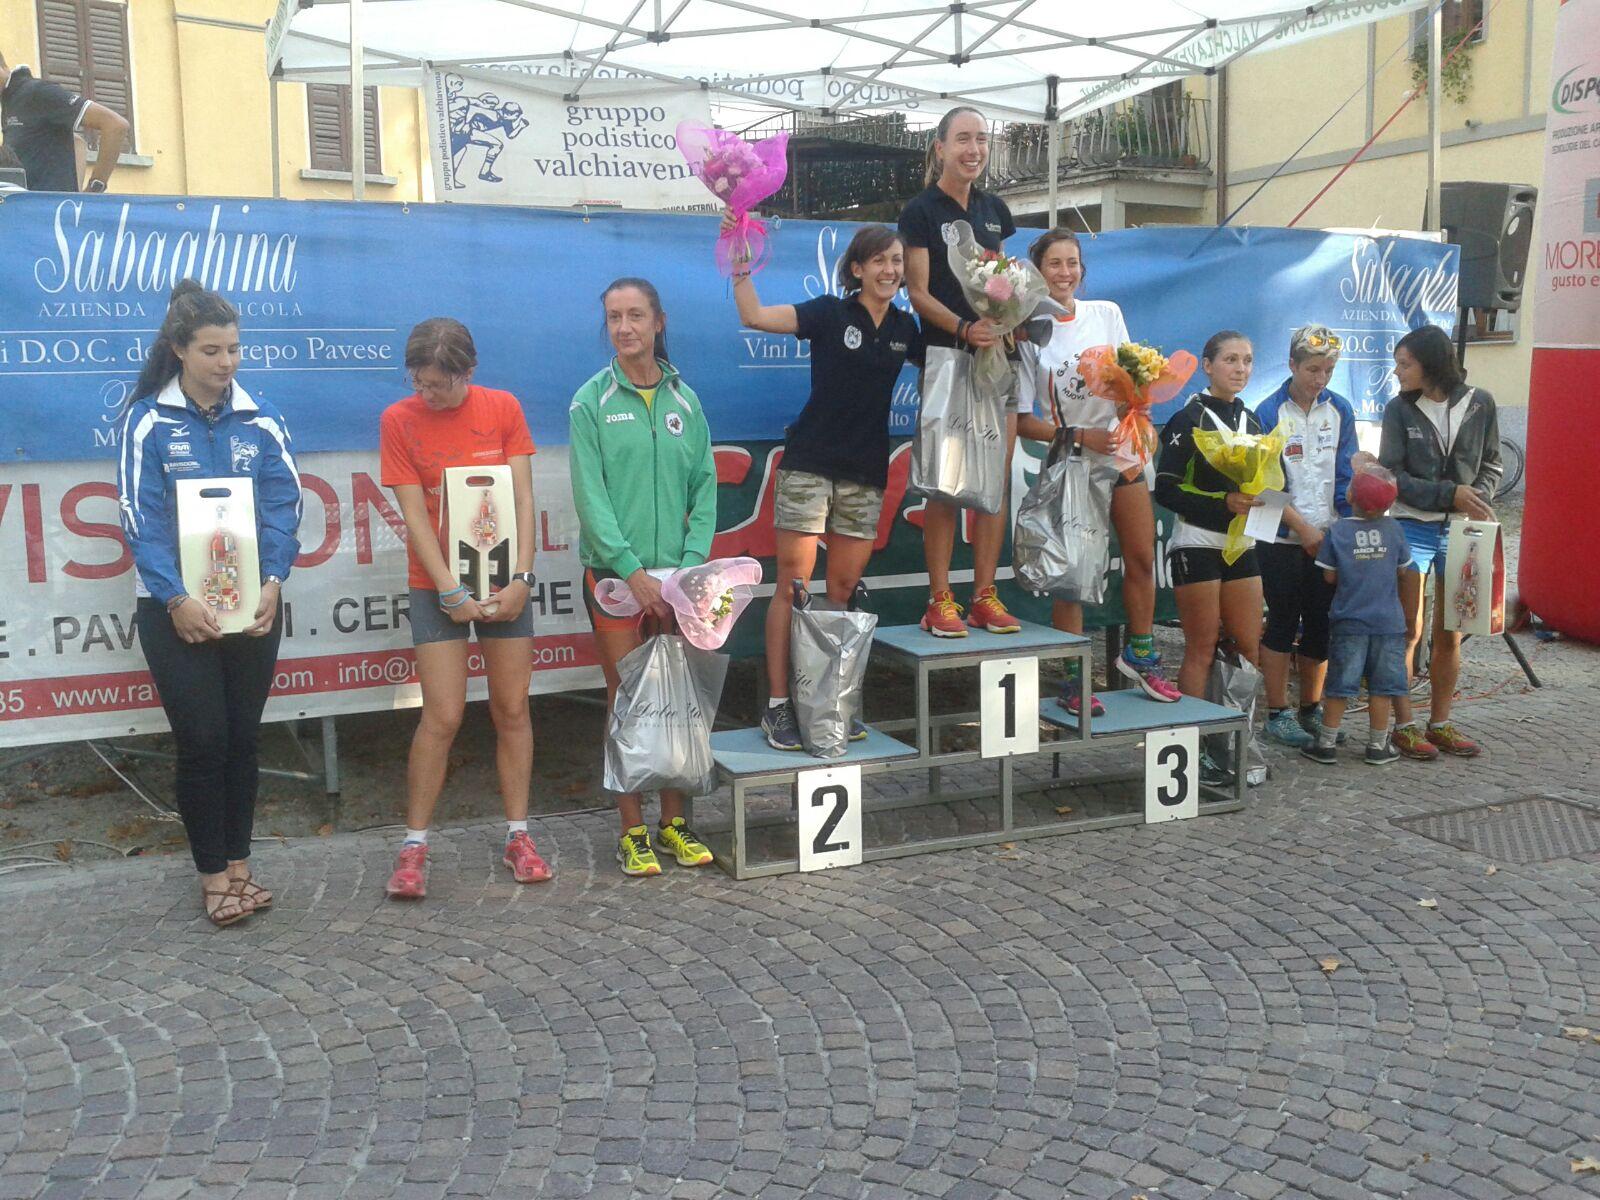 podio marmitte 2015 femminile